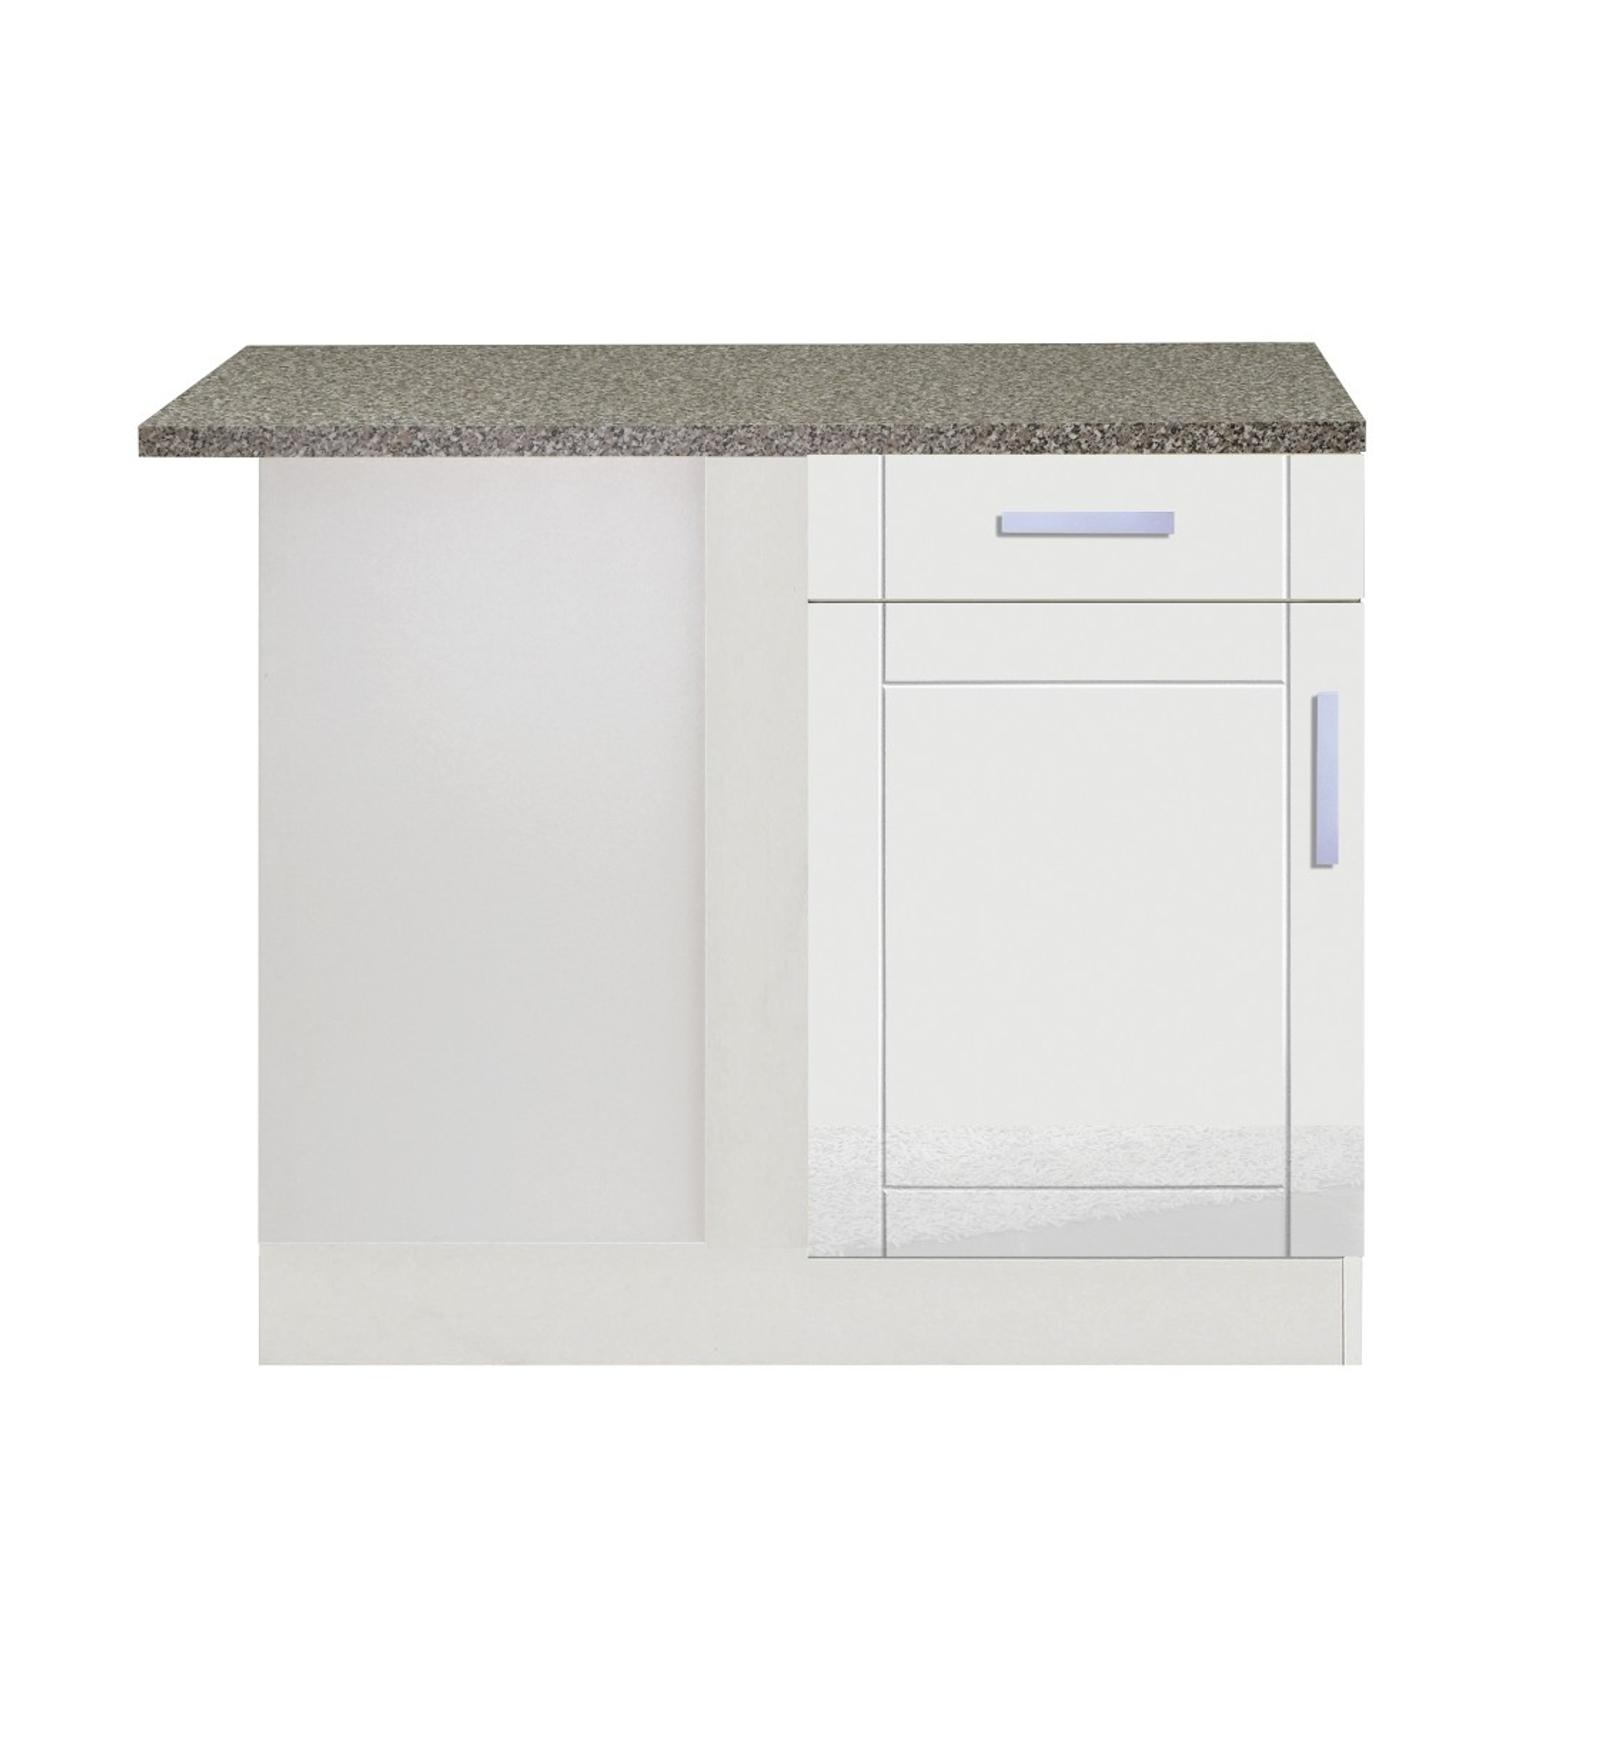 k chen eckunterschrank varel 1 t rig 110 cm breit. Black Bedroom Furniture Sets. Home Design Ideas